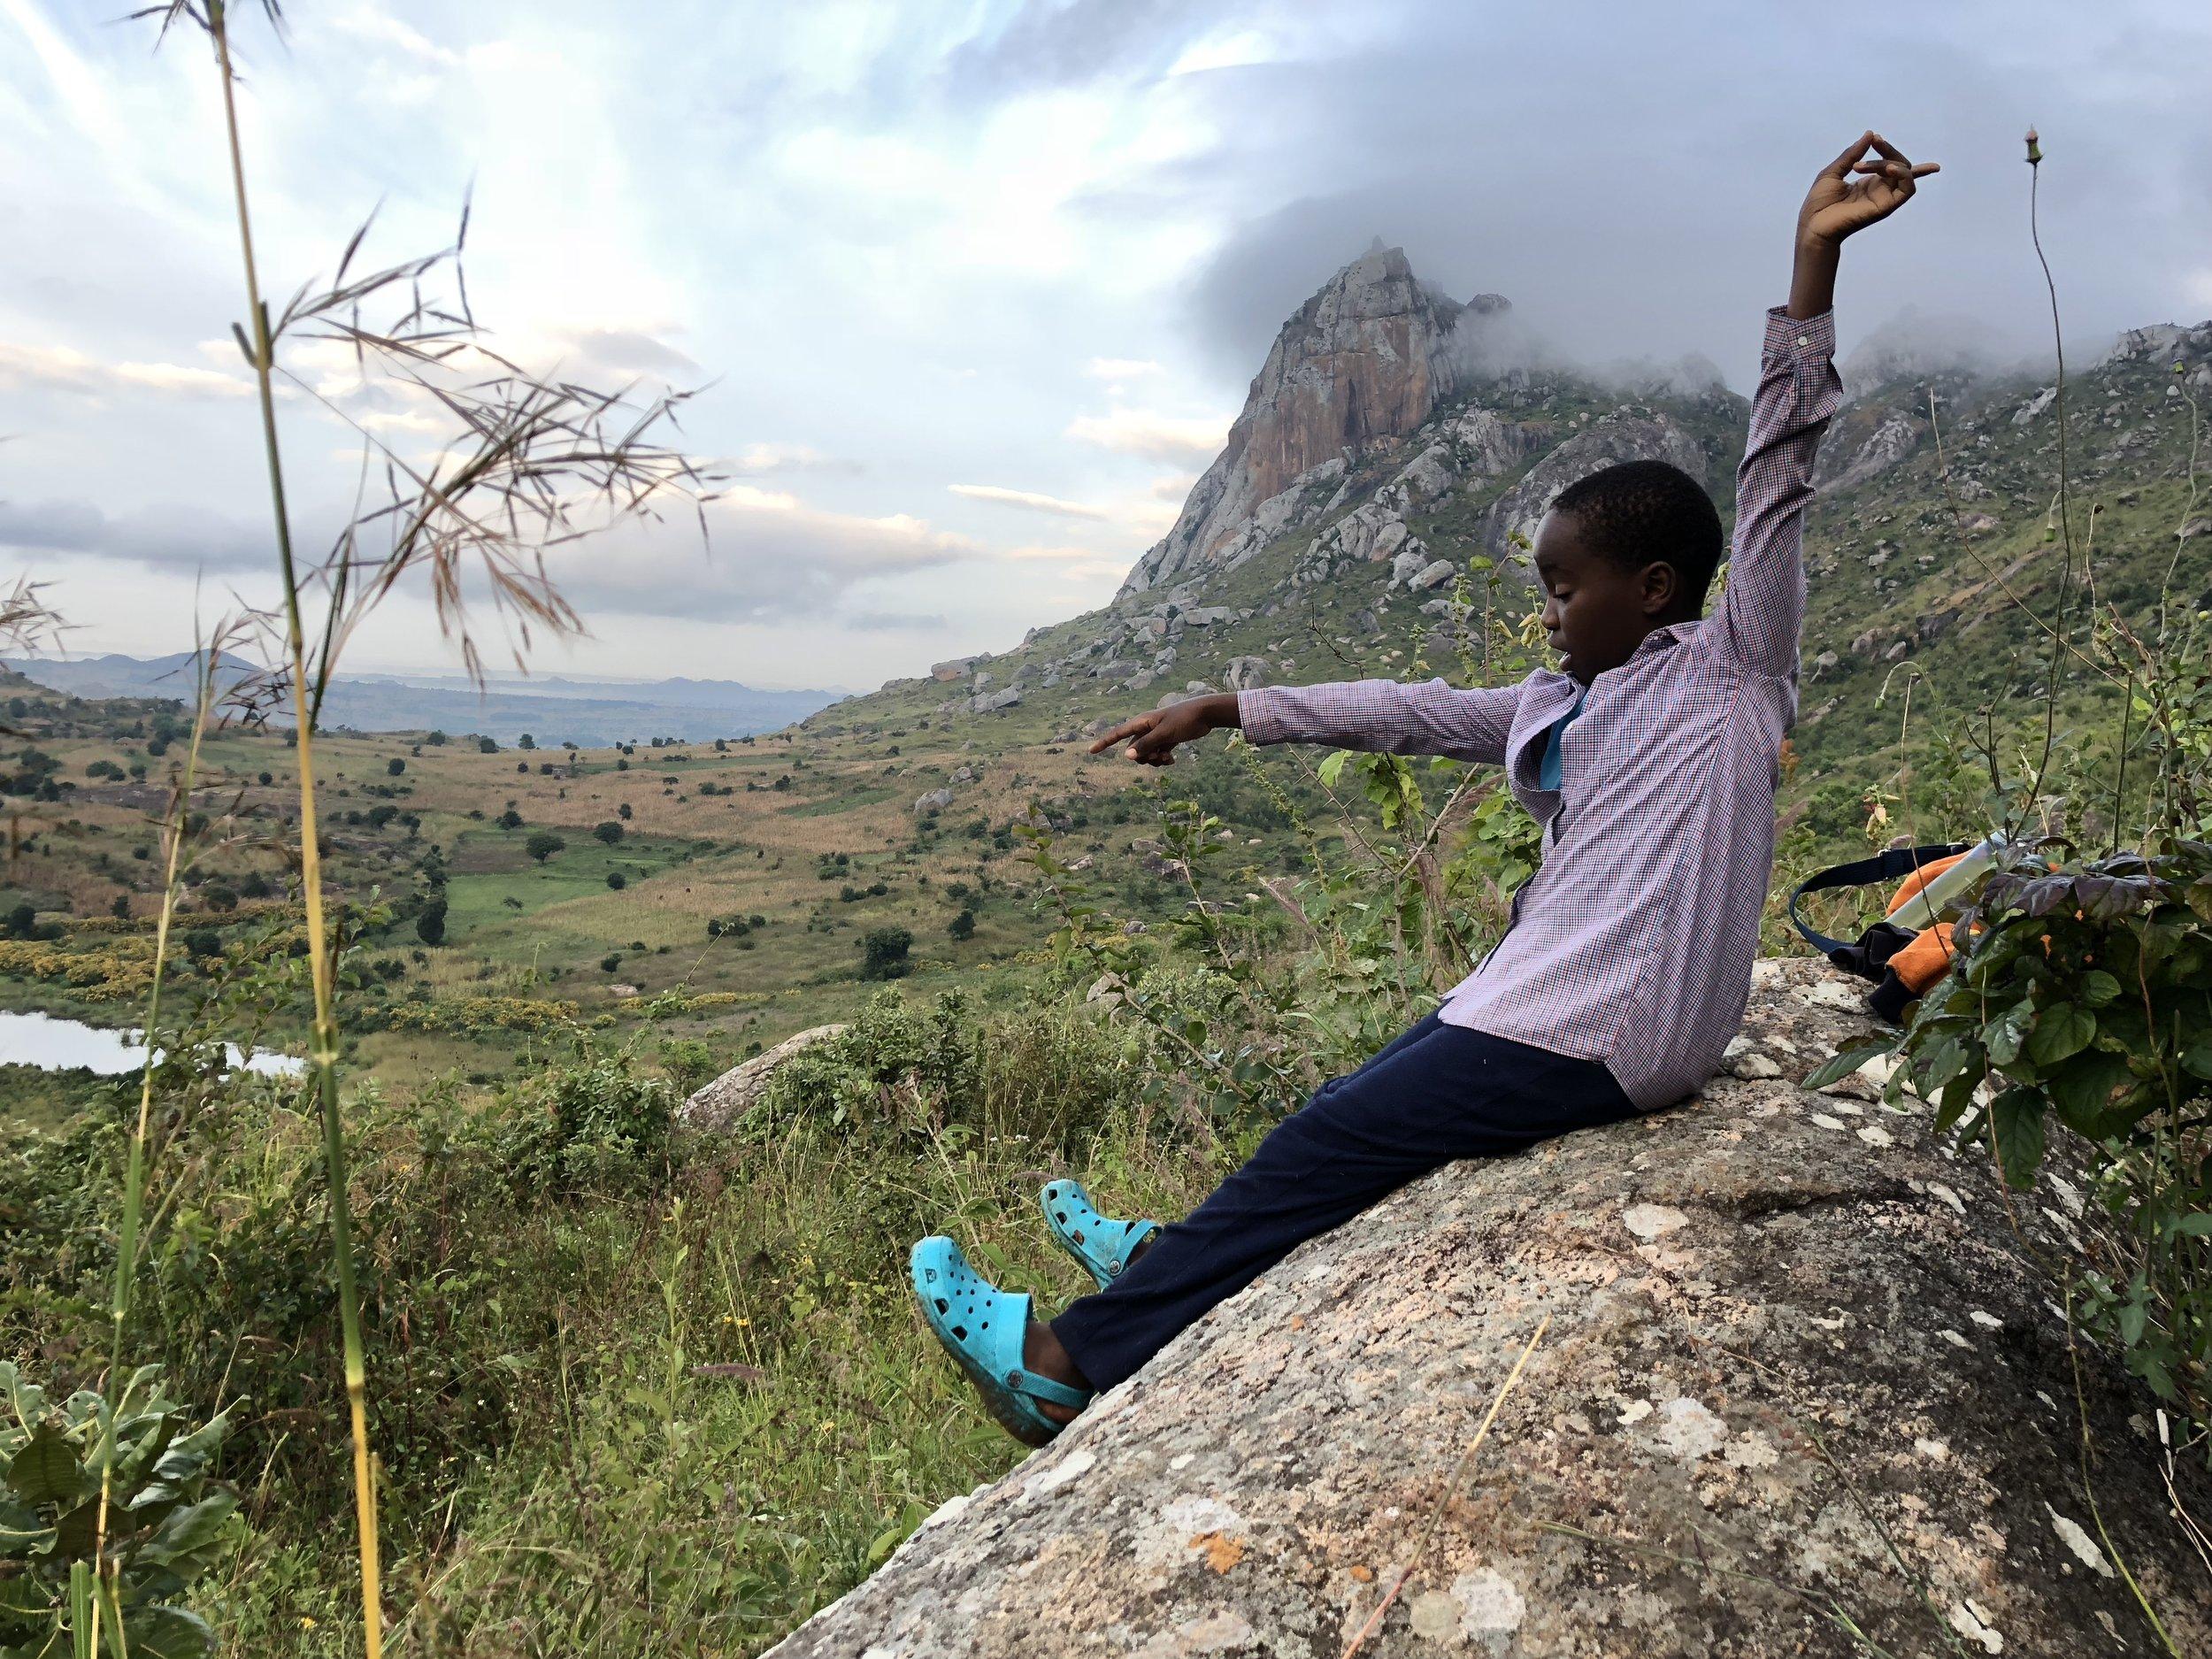 Mwenecho tells stories at the base of Mount Nkhoma